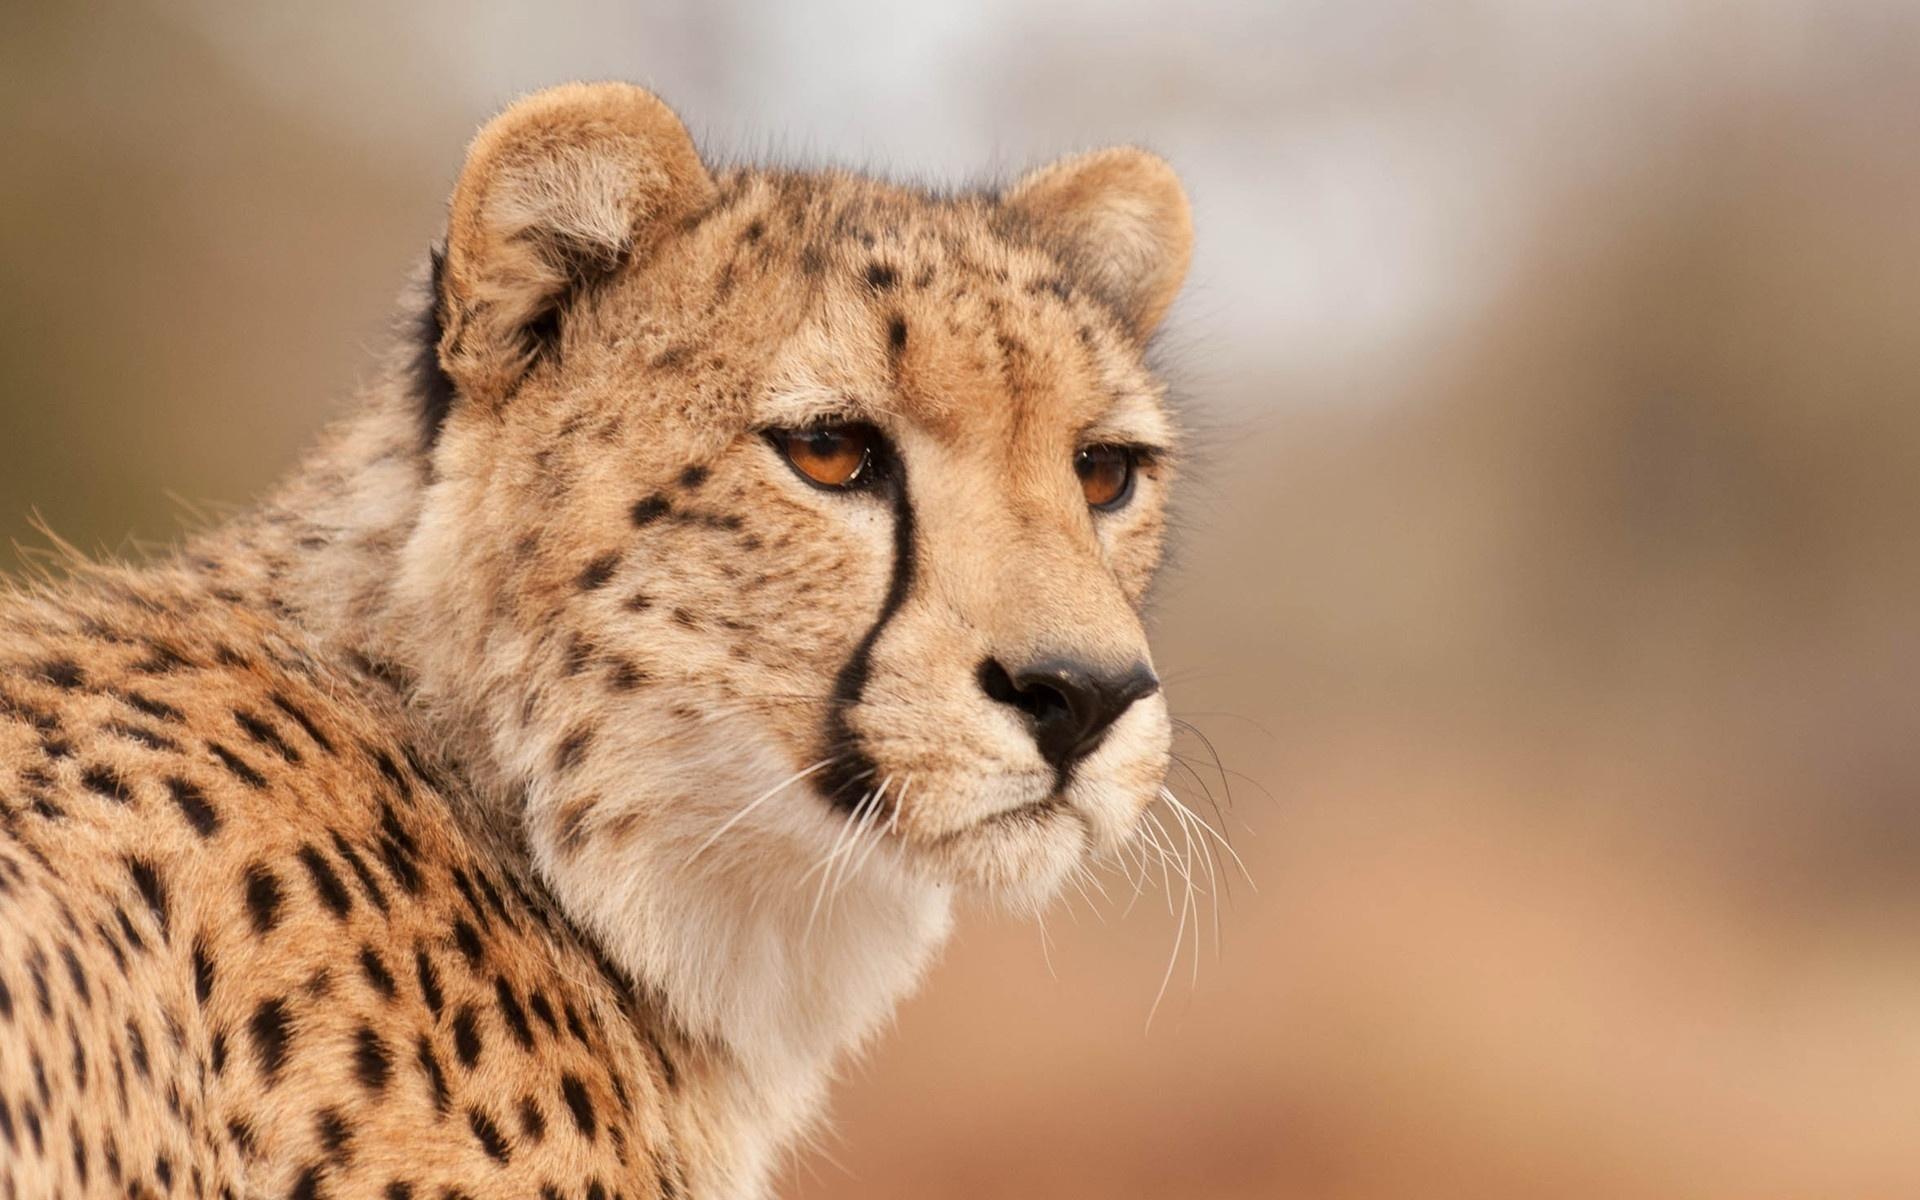 Cool Cheetah Wallpaper Best Cheetah Image And HD 2017